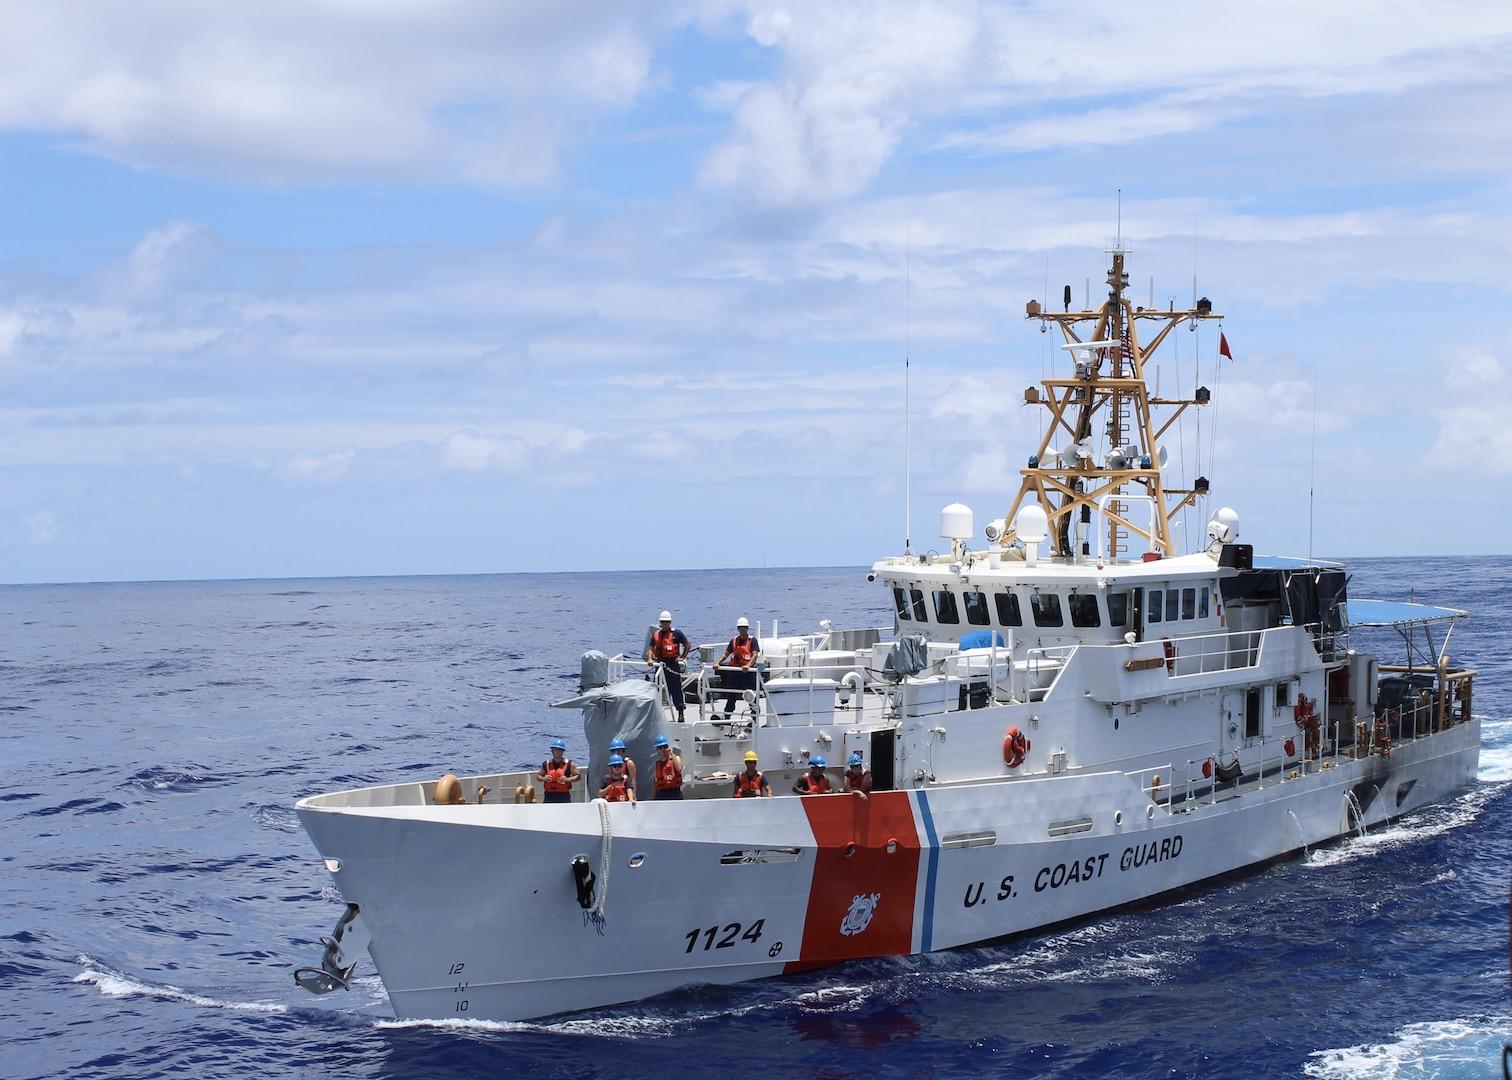 Coast Guard cutter crews conclude Operation Aiga in Oceania